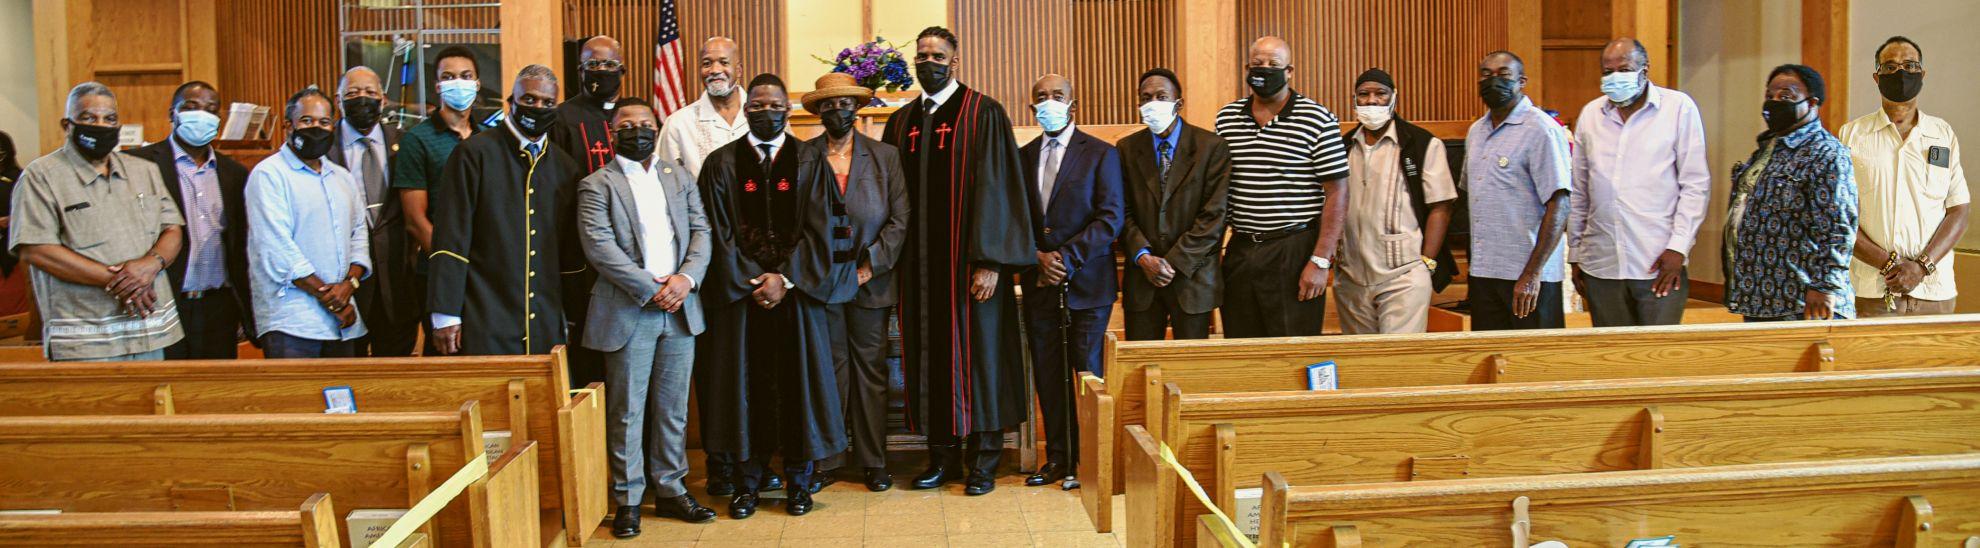 Twelfth Baptist Church Men from Laymen's Sunday Sept. 19, 2021